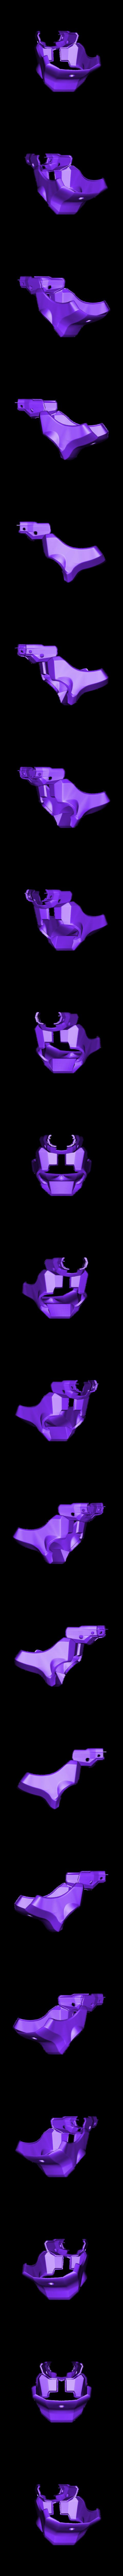 Lucio_lower.stl Download free STL file Overwatch Lucio Blaster • 3D printer object, Adafruit